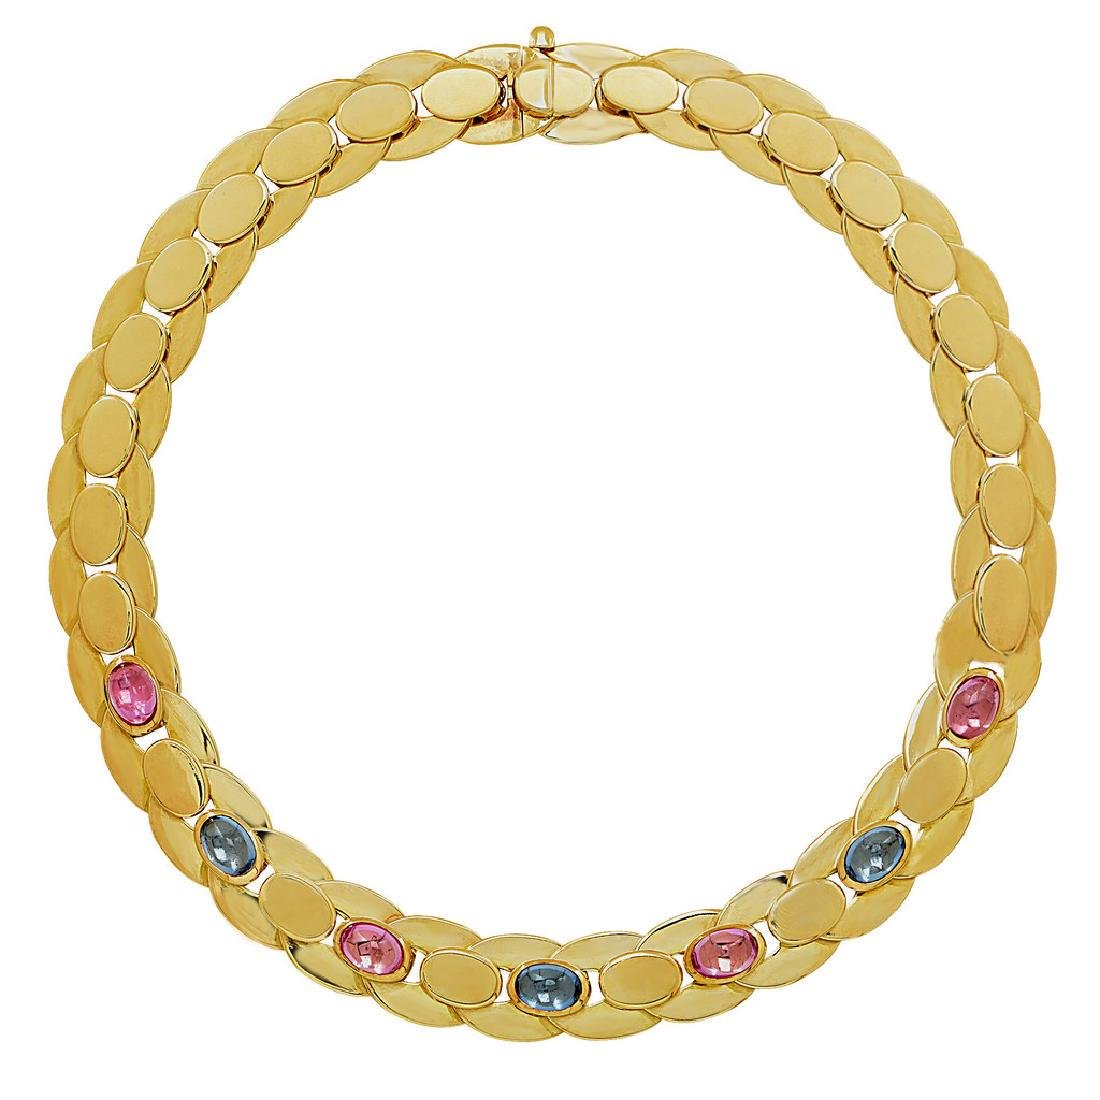 Marina B. Yellow Gold Sapphire Necklace, 25ctw